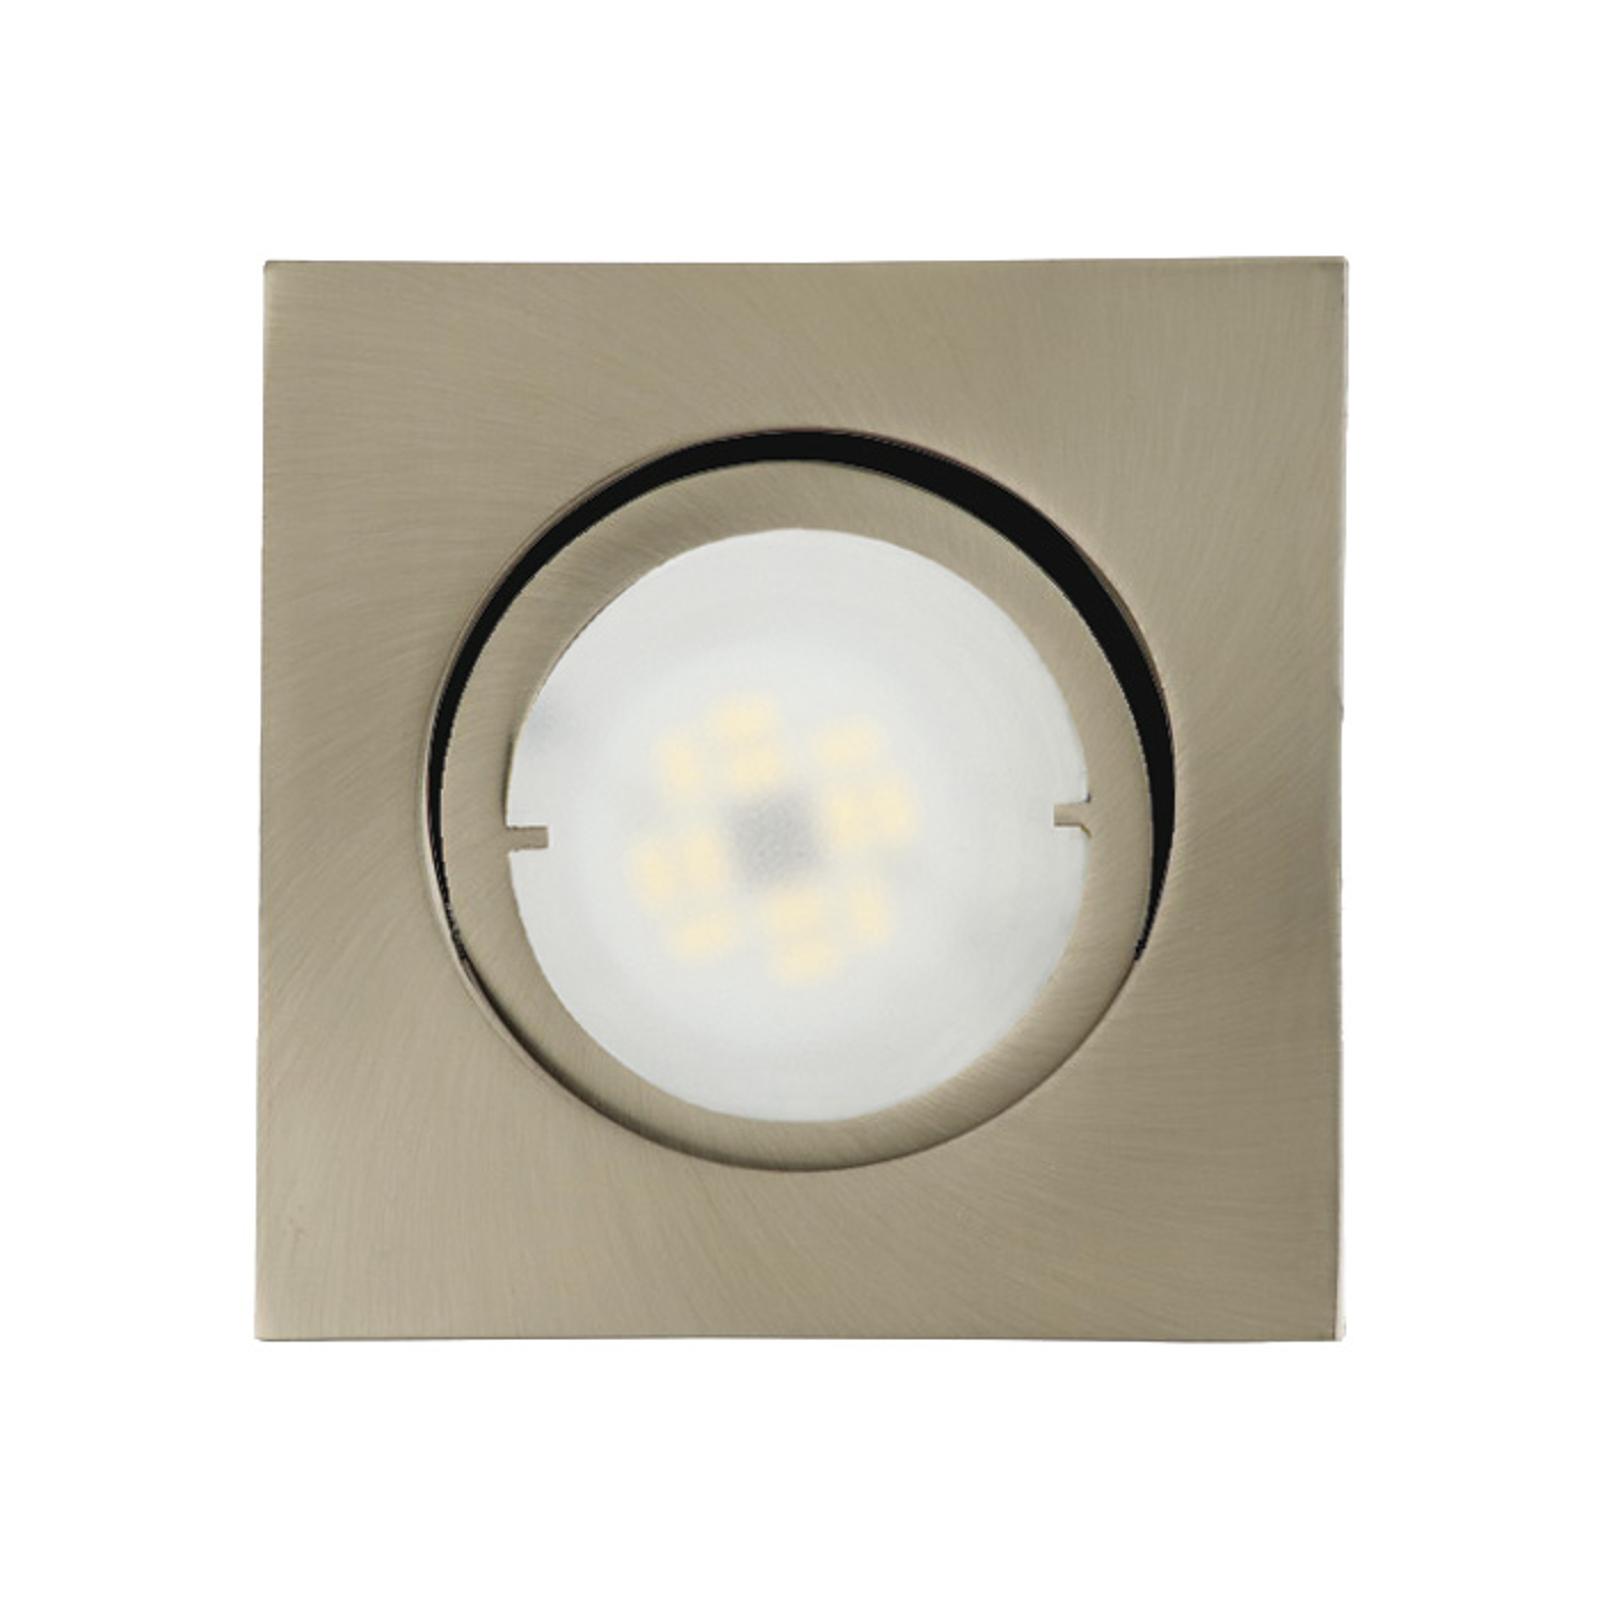 Joanie - LED-innbyggingslampe, jern børstet